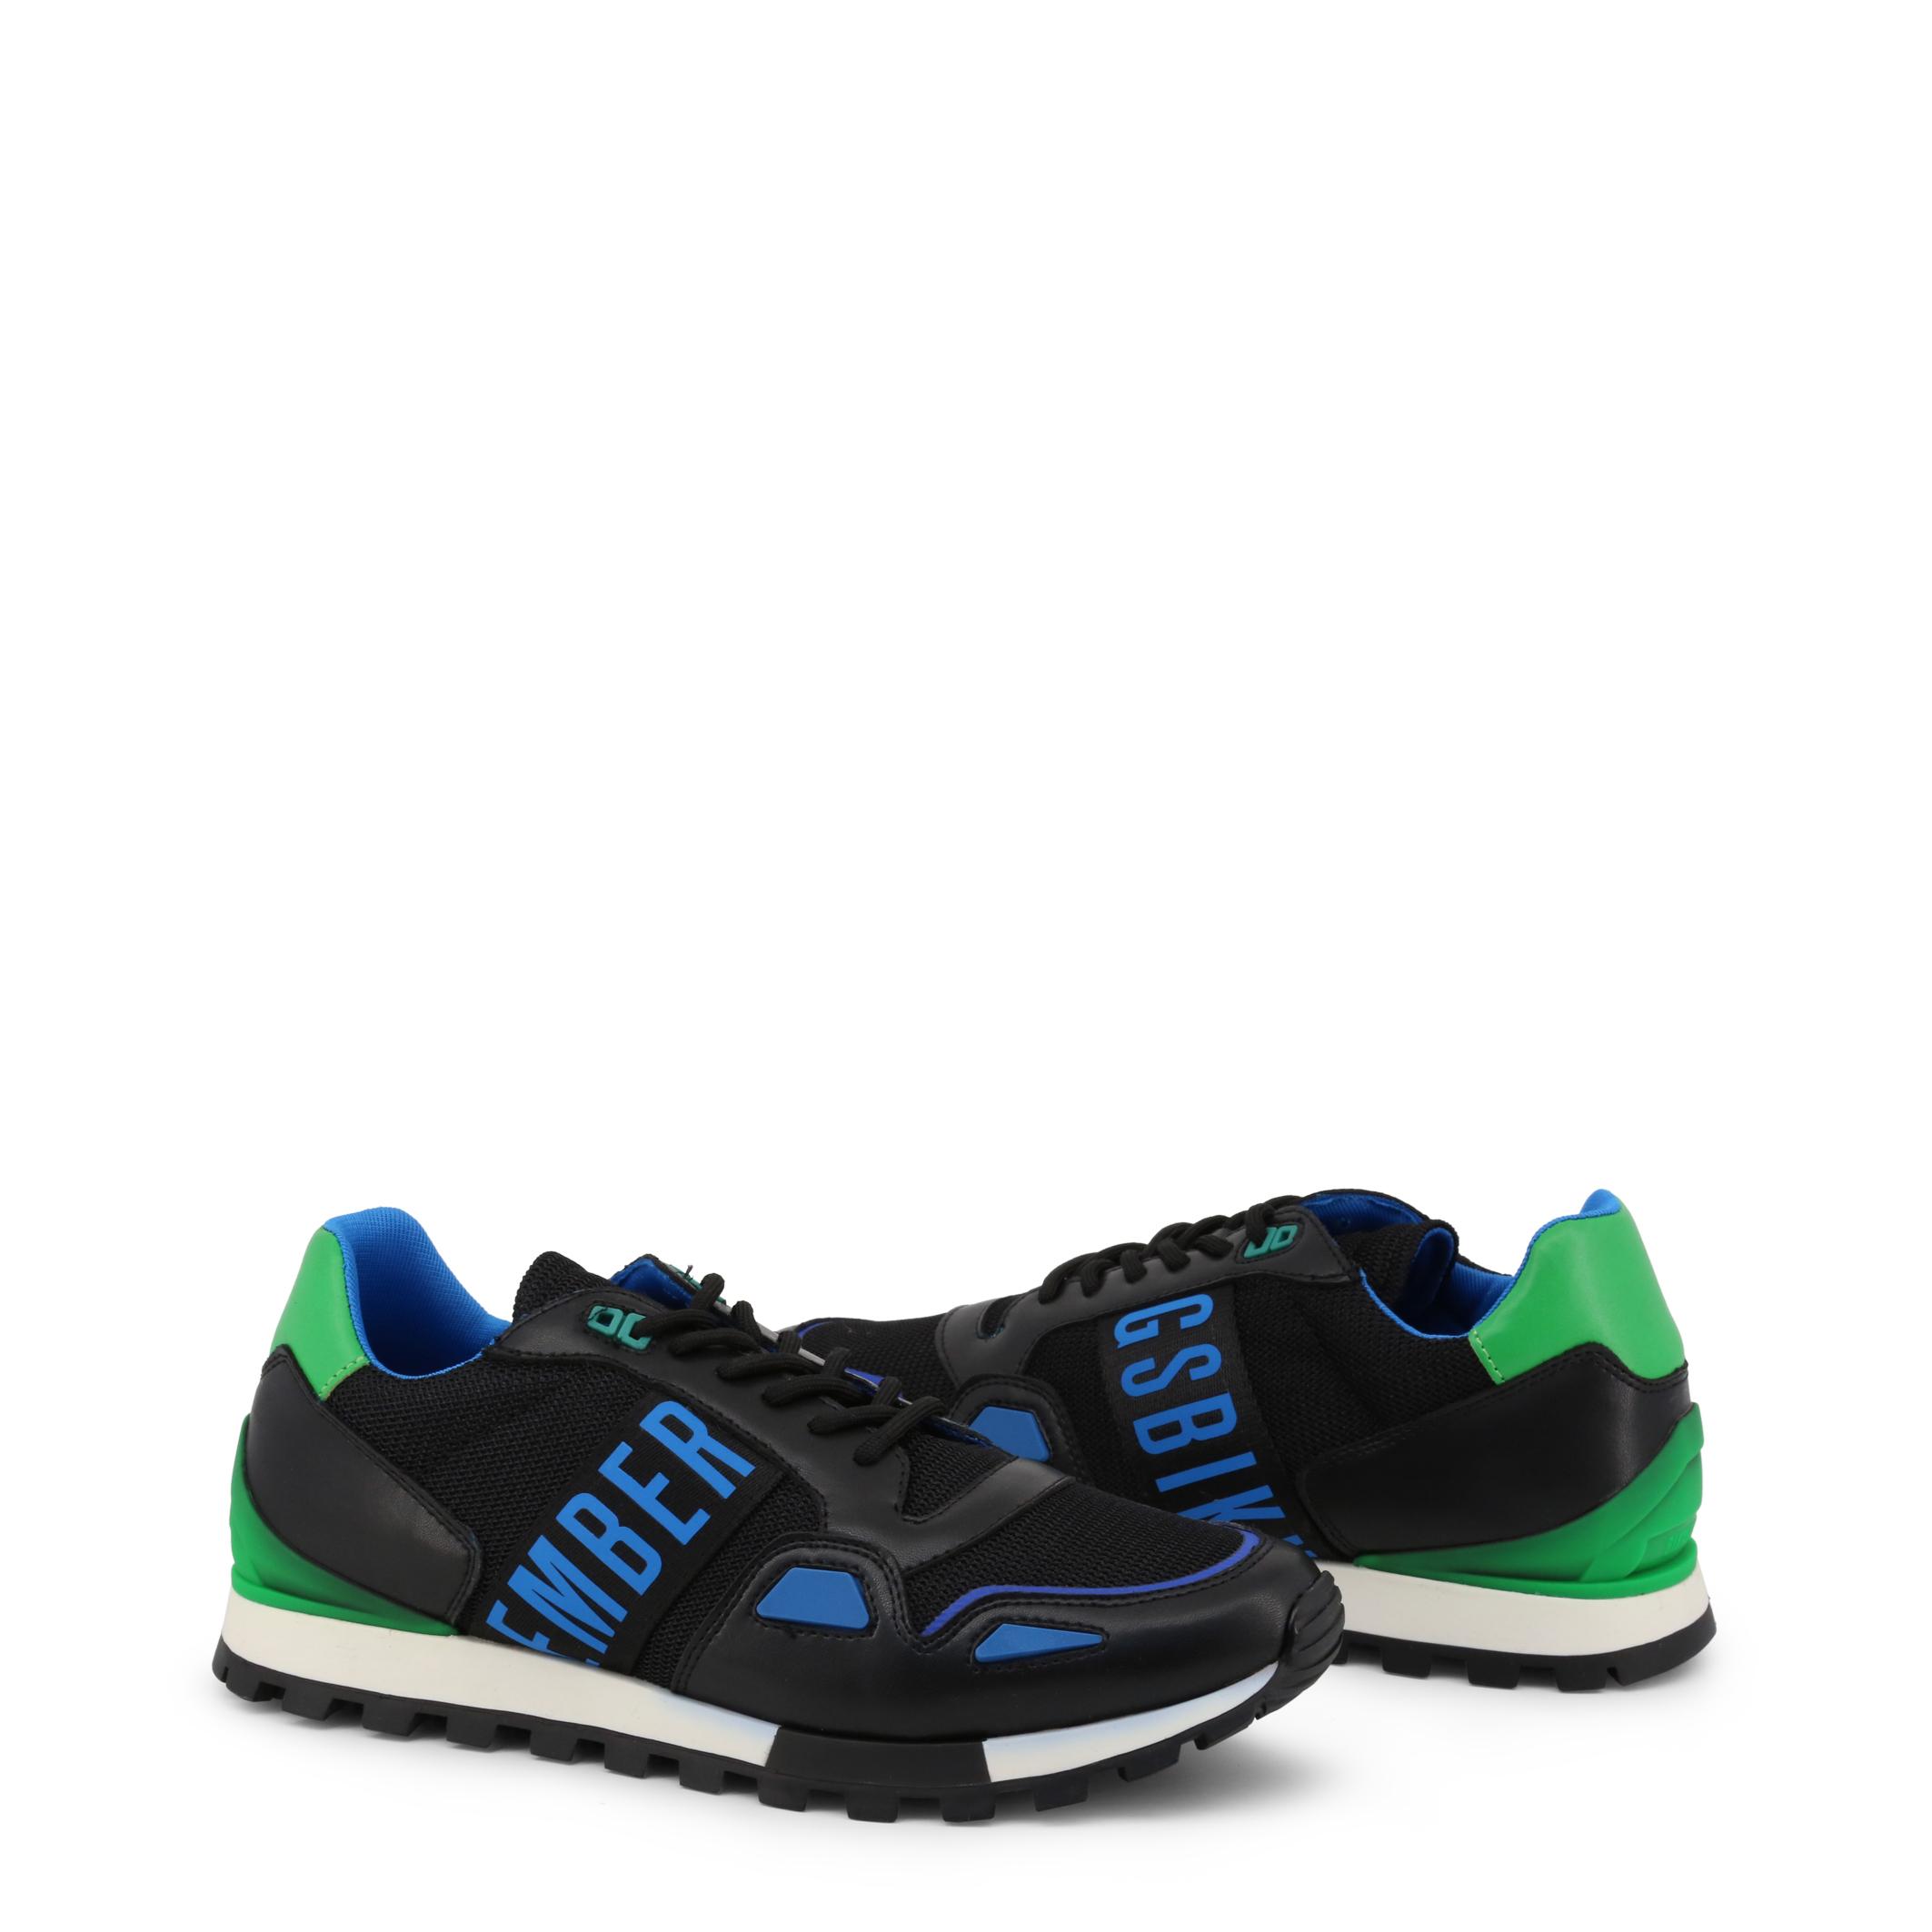 Sneakers-Bikkembergs-FEND-ER-2232-Uomo-Nero-101346 miniatura 2